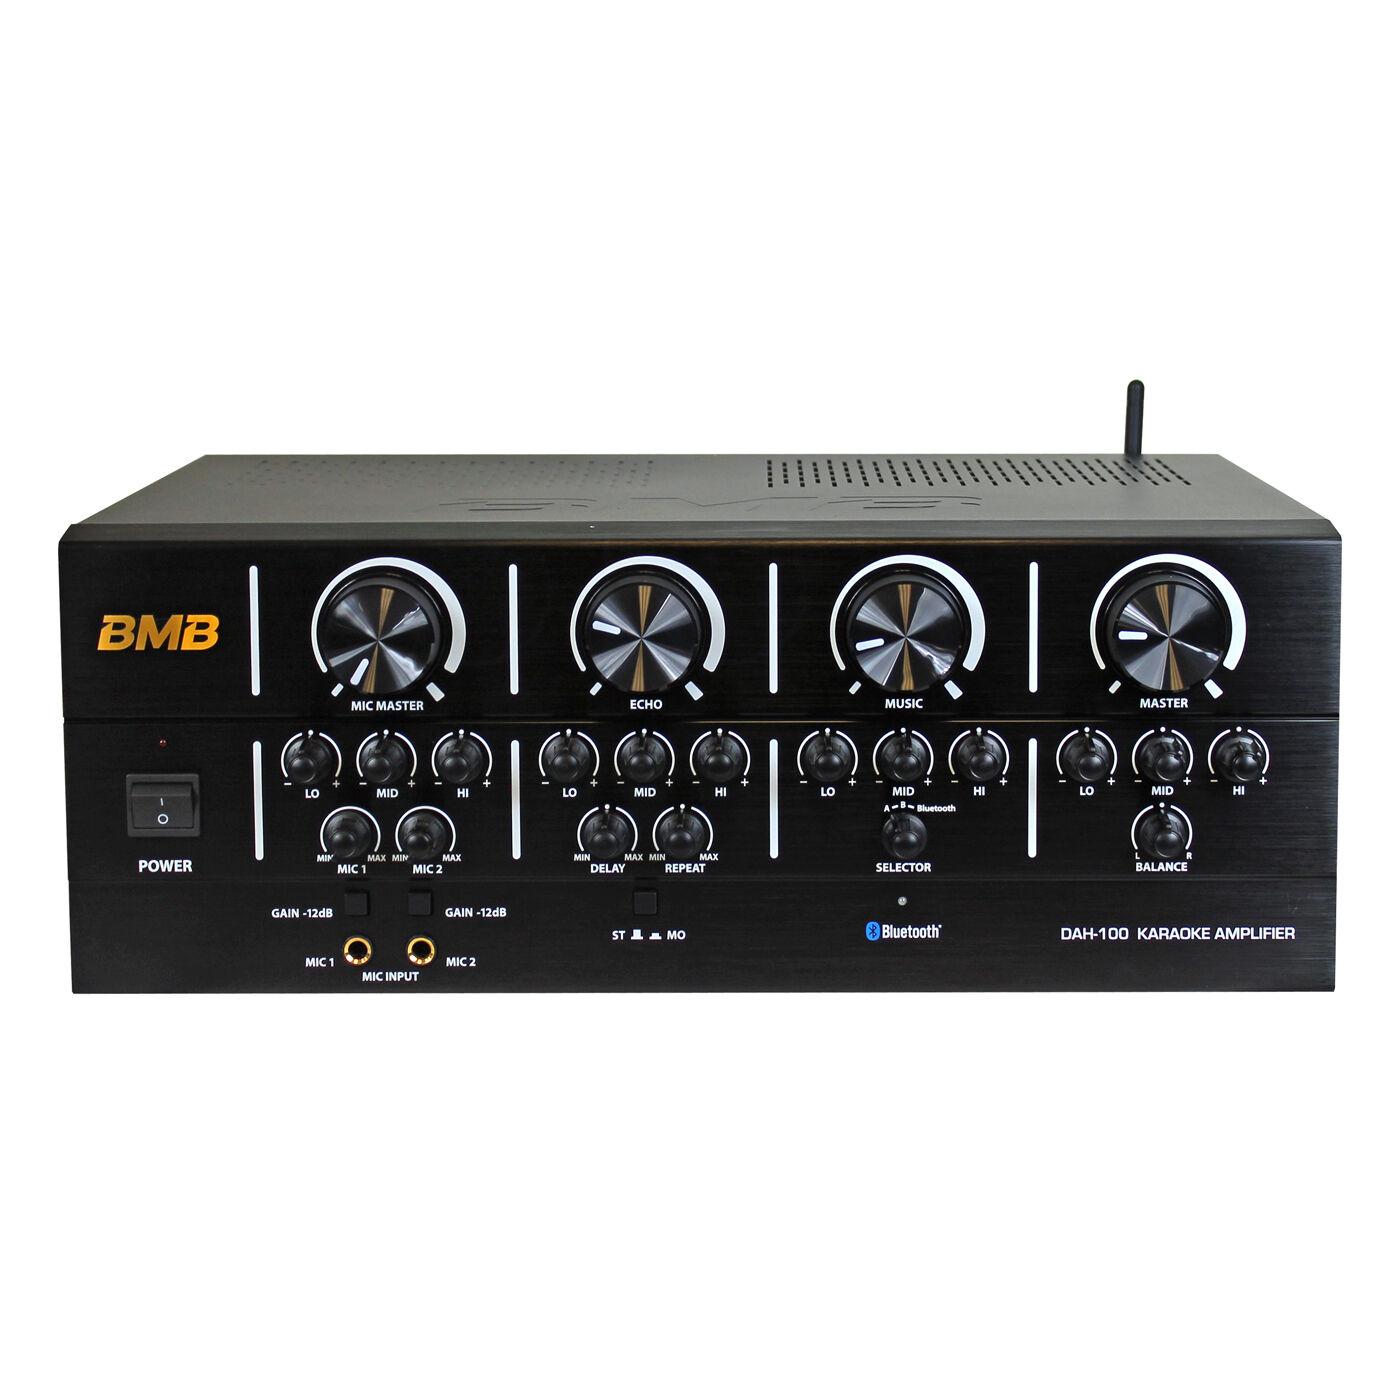 BMB DAH-100 Karaoke Mixing Amplifier with blueetooth